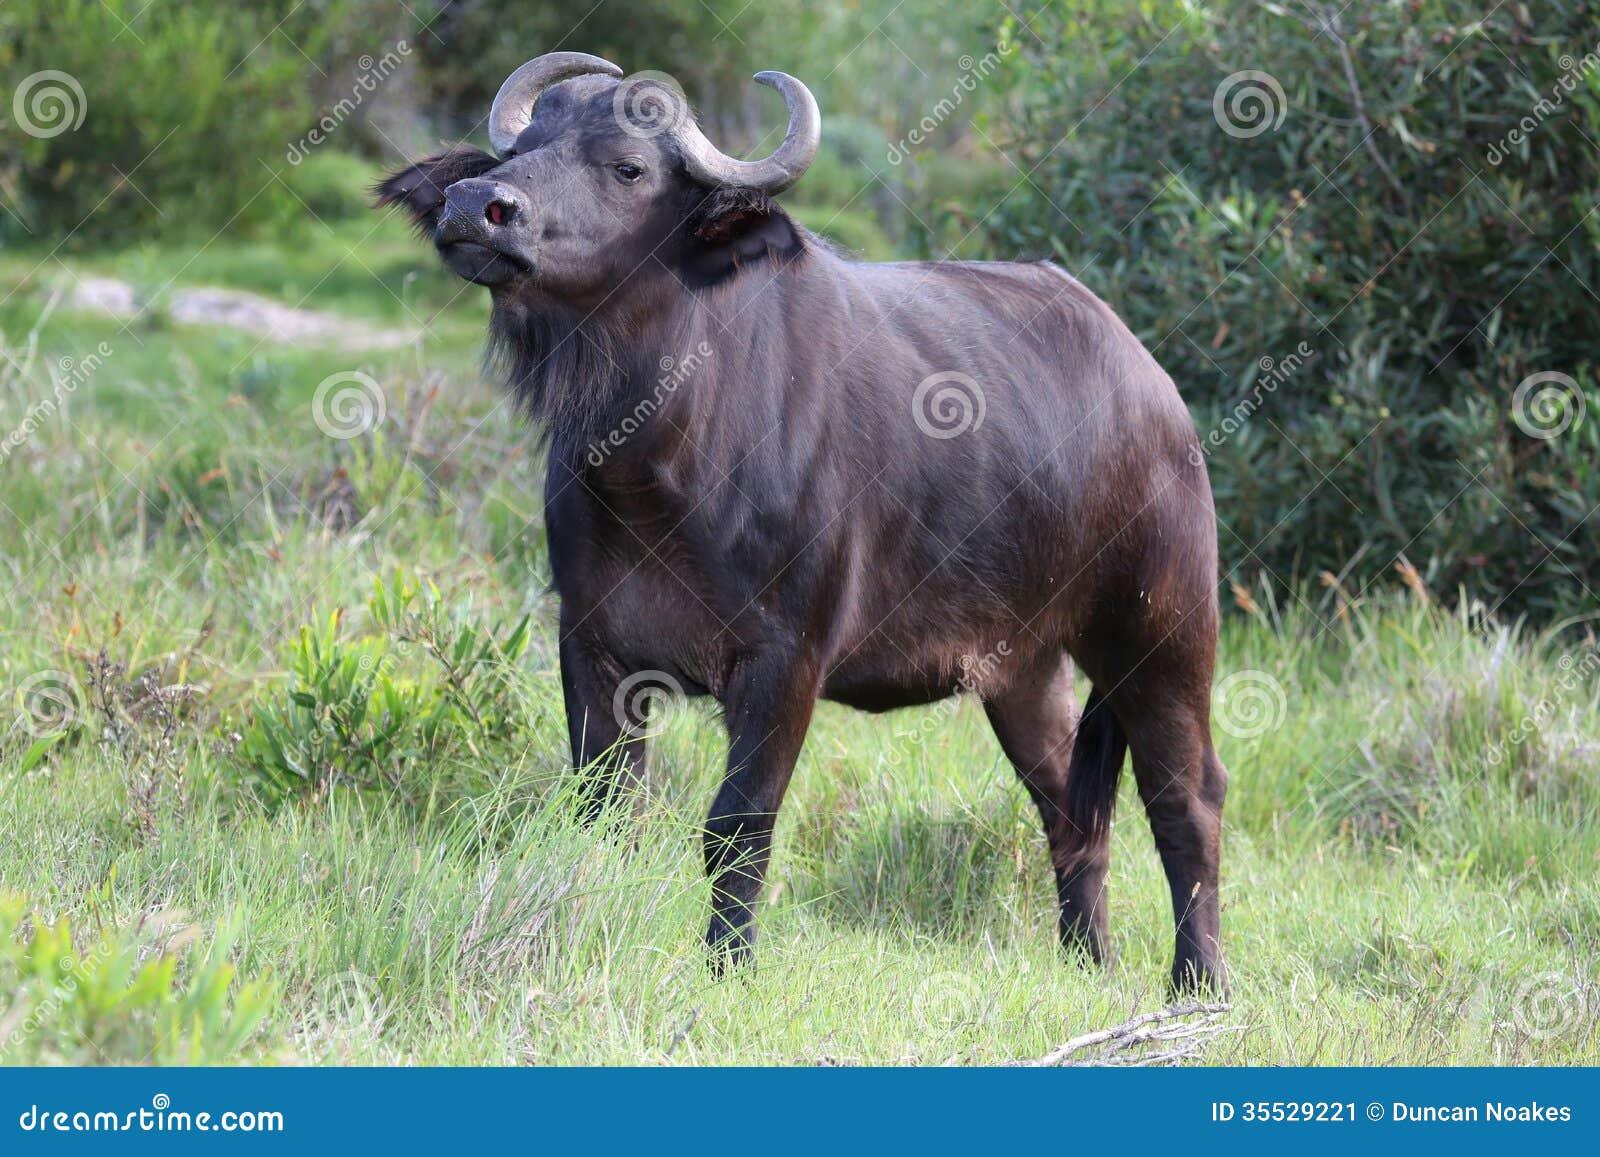 For Alpha Buffalo Looking Bull